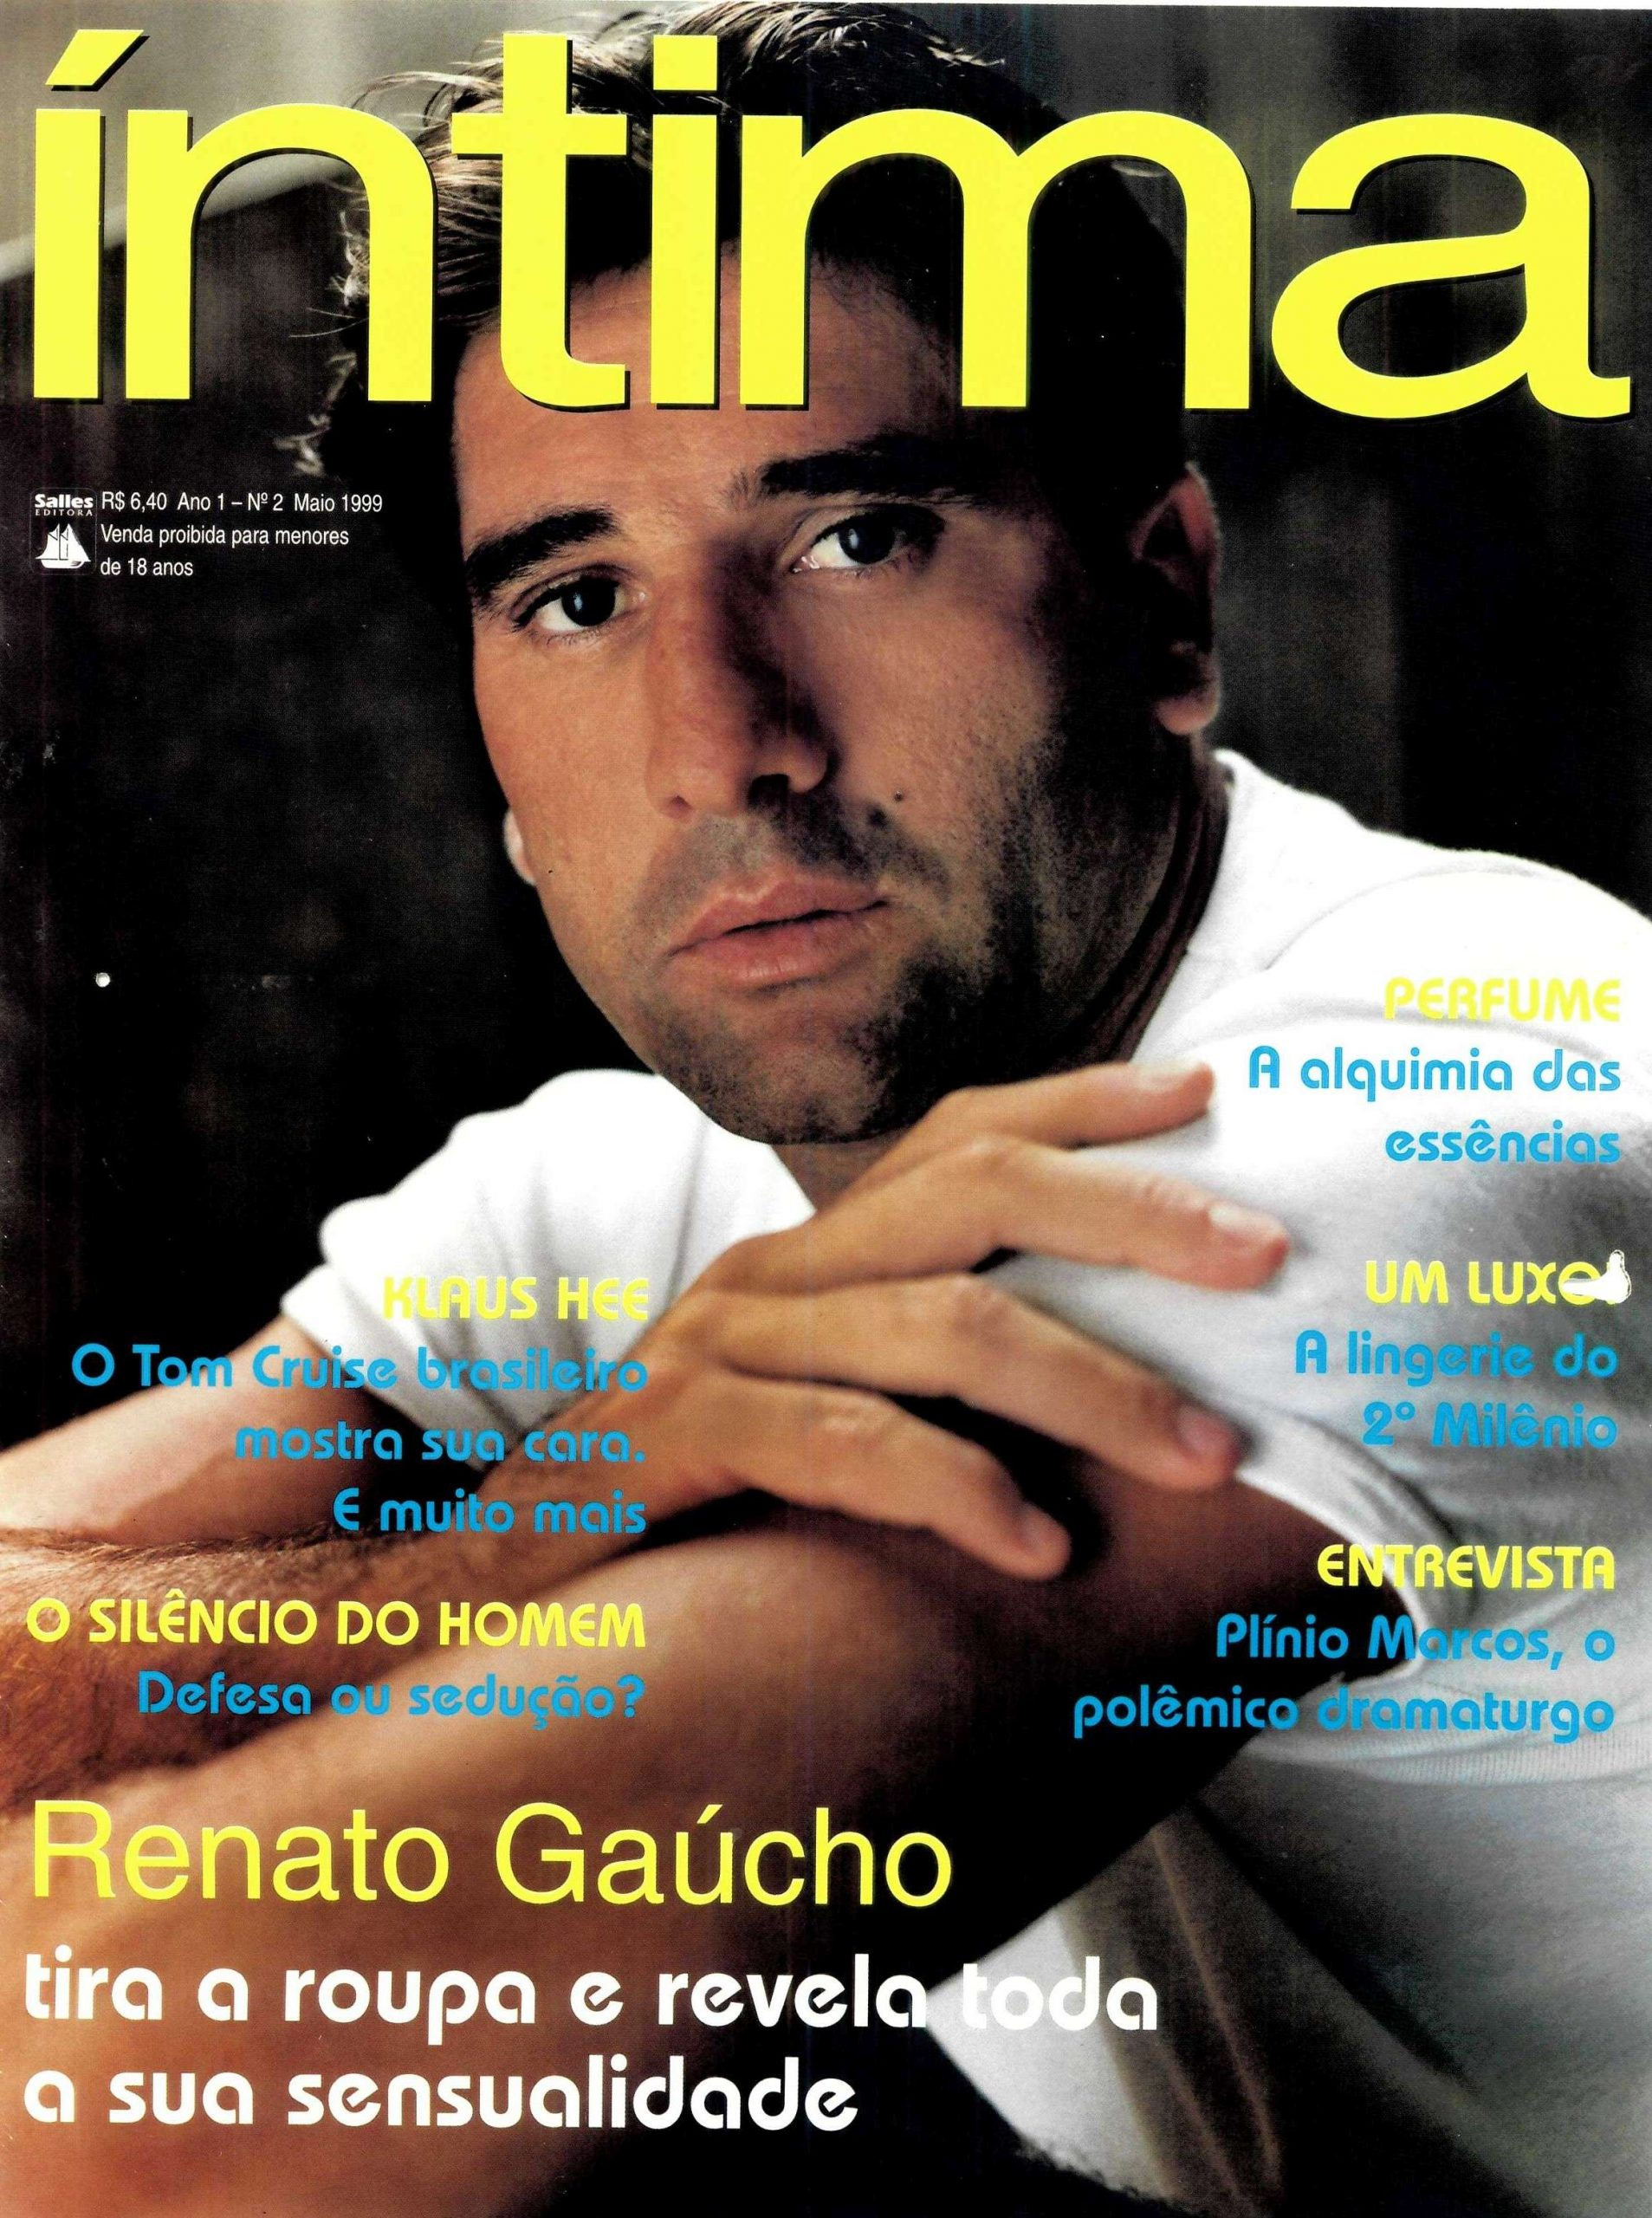 You are currently viewing Íntima, Renato Gaúcho